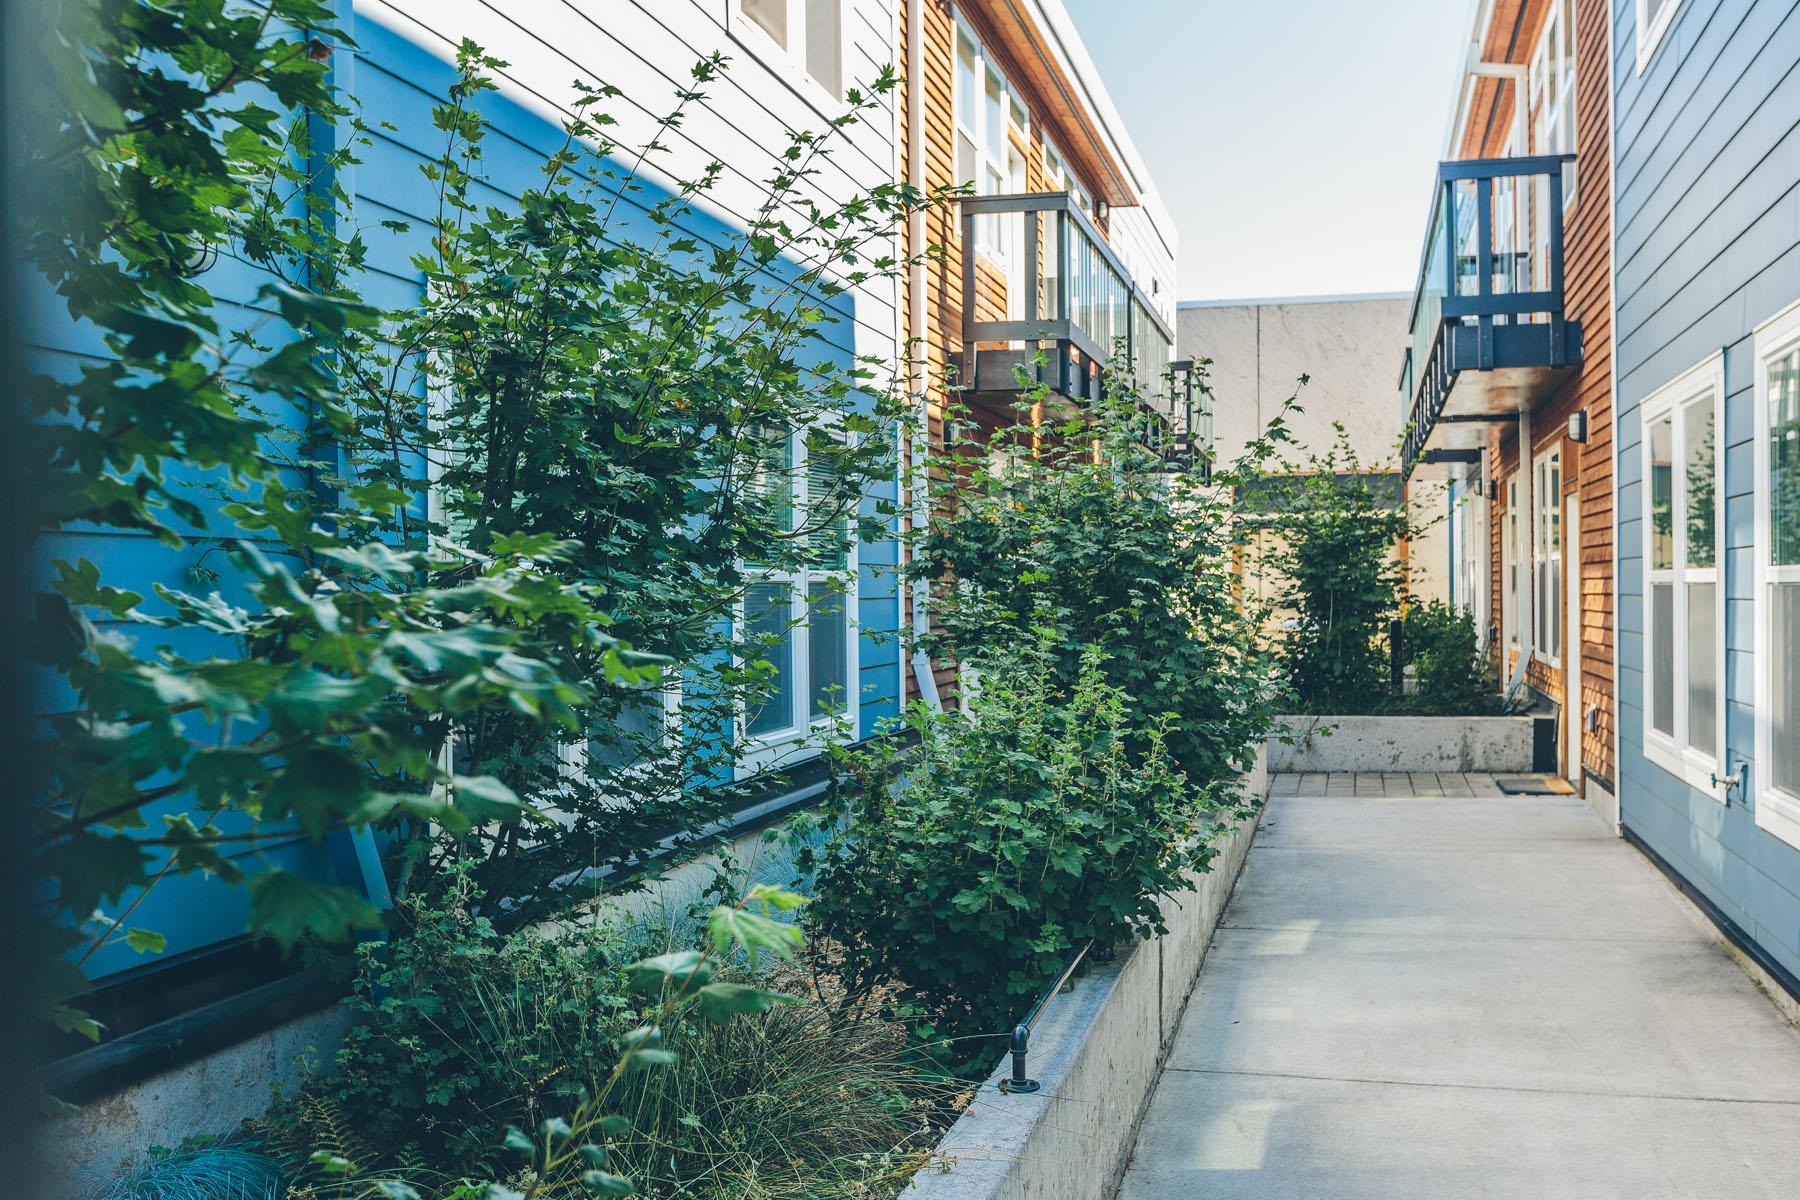 ekoliving-property-spruce-03.jpg